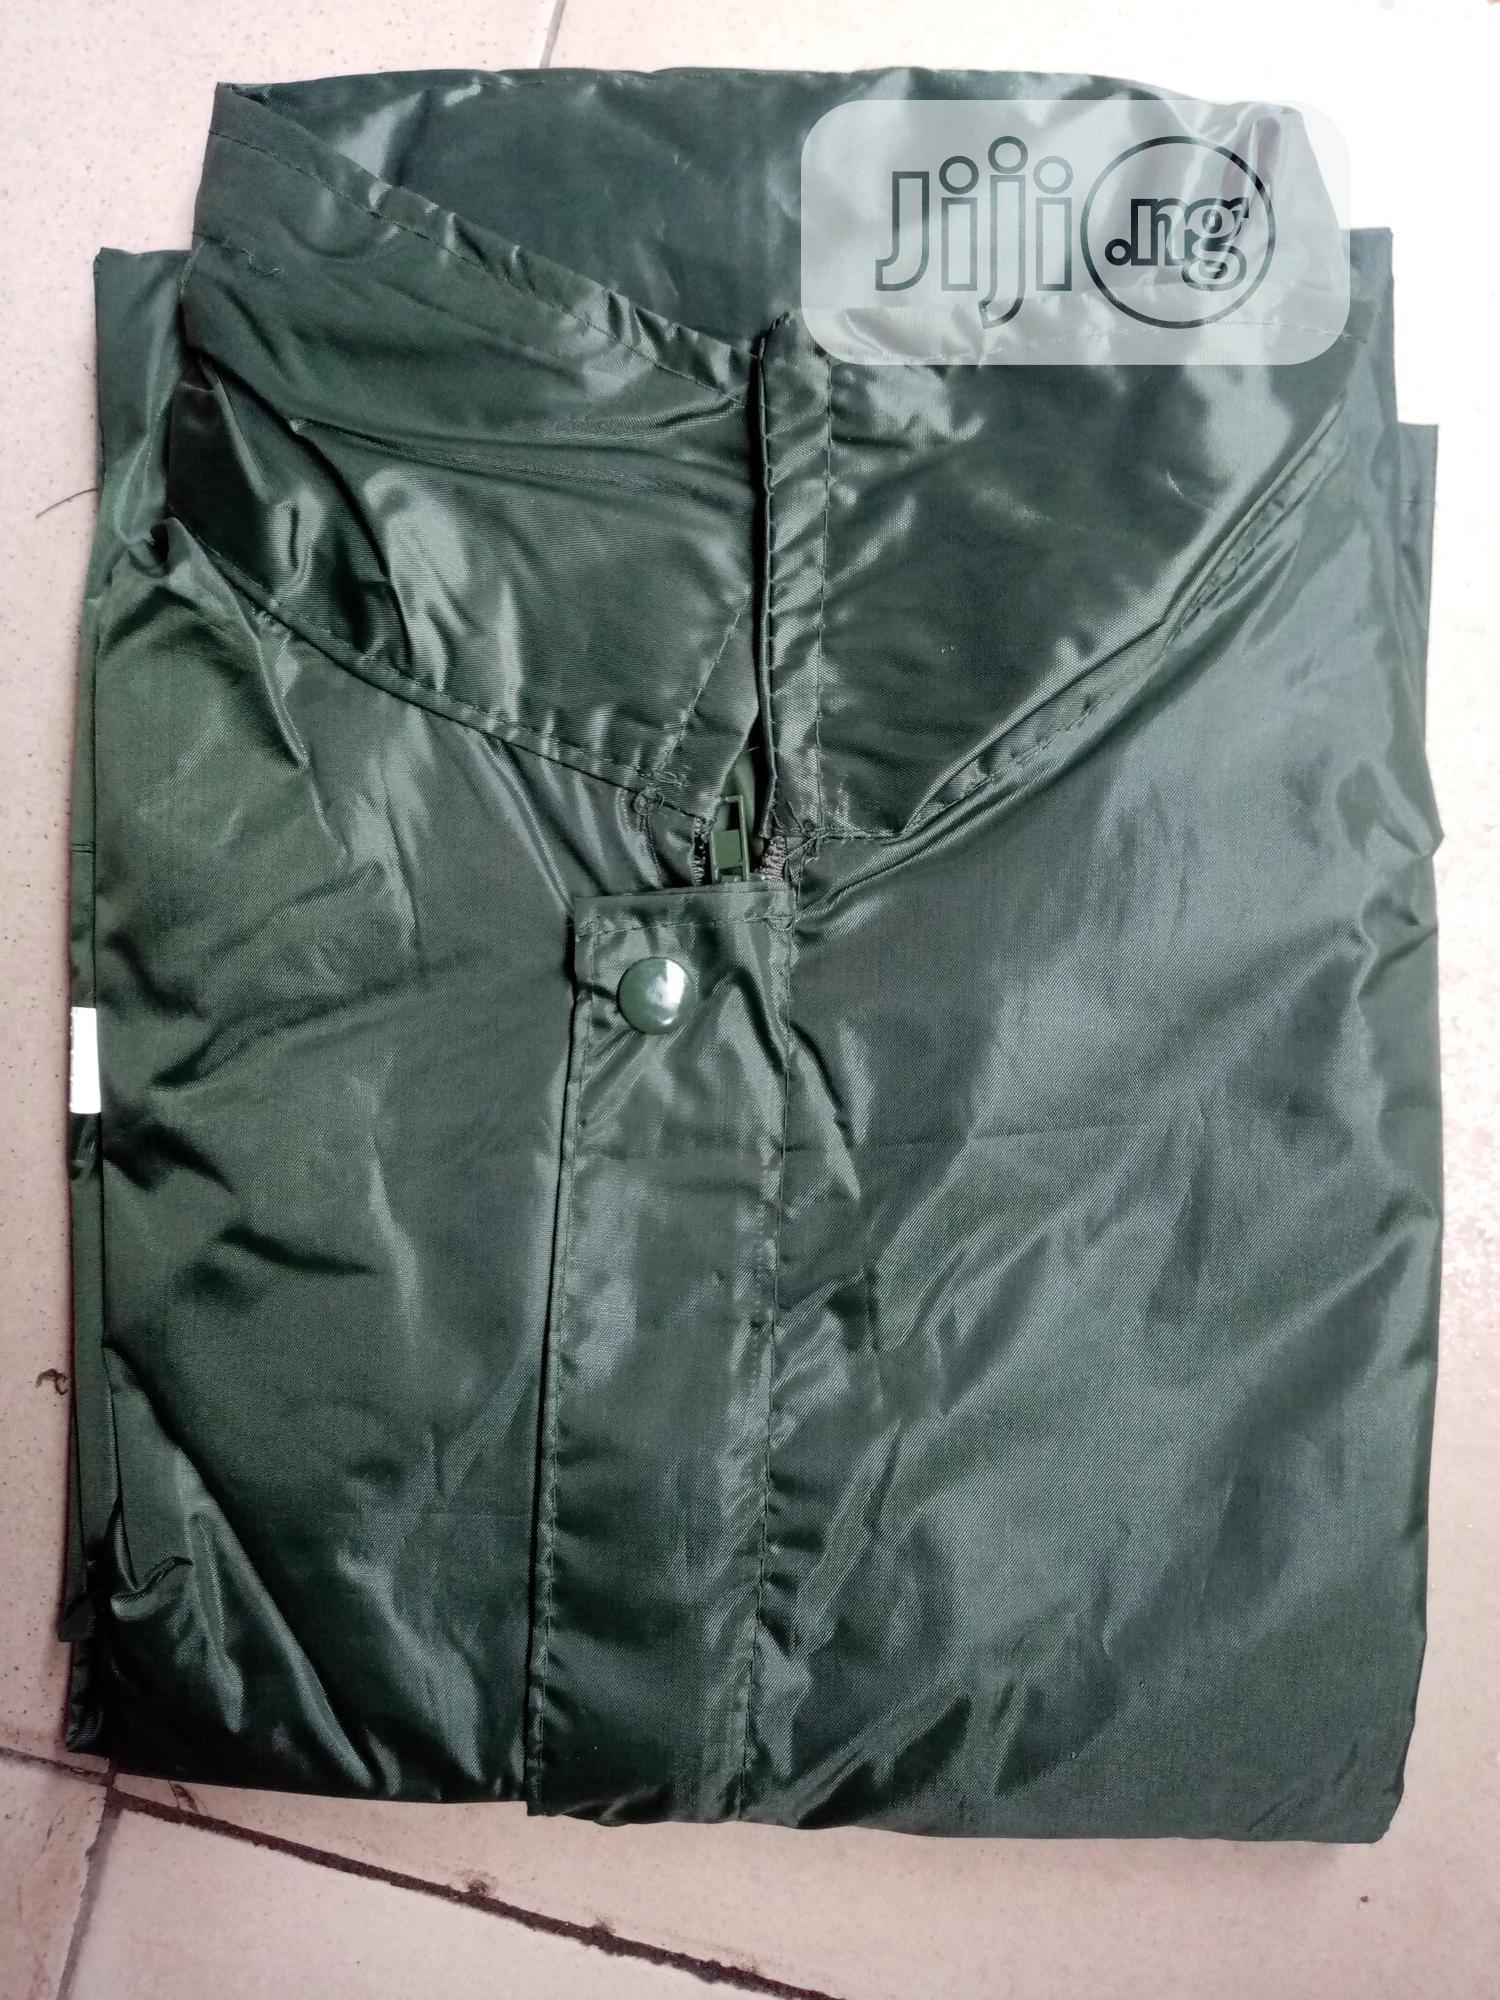 Rain Coat With Reflective | Safetywear & Equipment for sale in Amuwo-Odofin, Lagos State, Nigeria